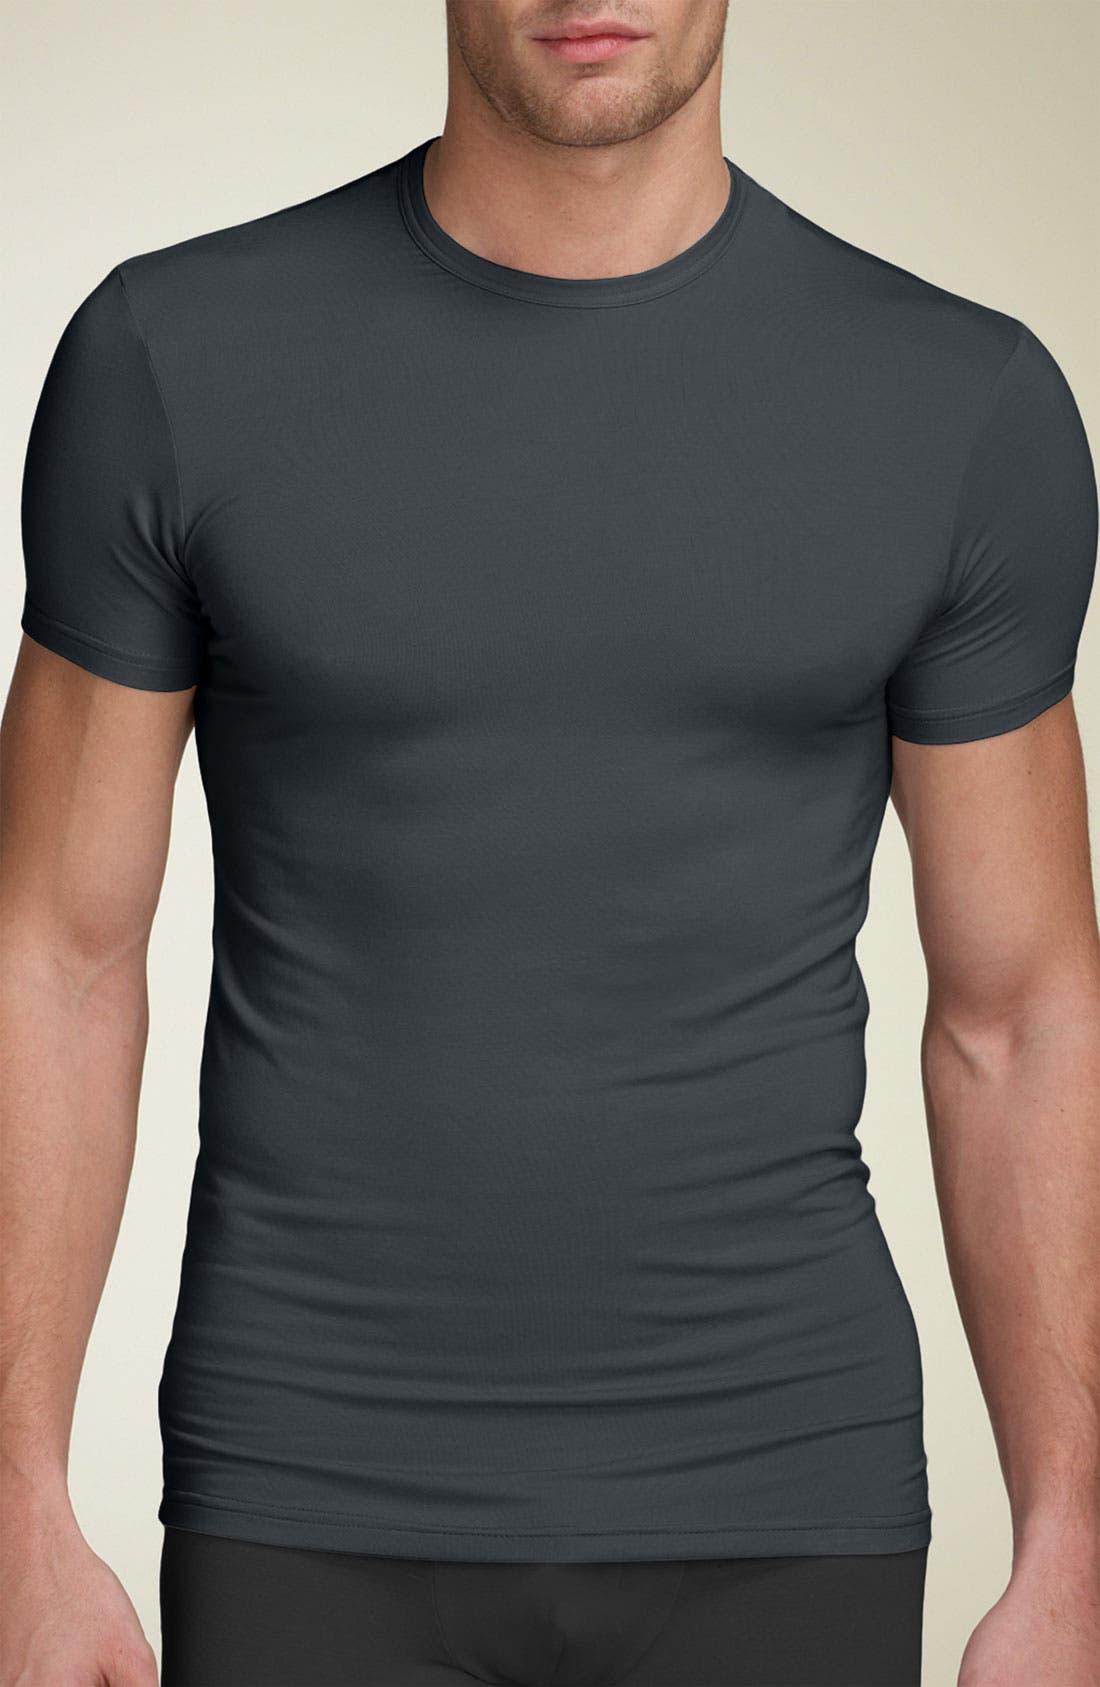 'U5551' Modal Blend Crewneck T-Shirt,                             Main thumbnail 1, color,                             MINK